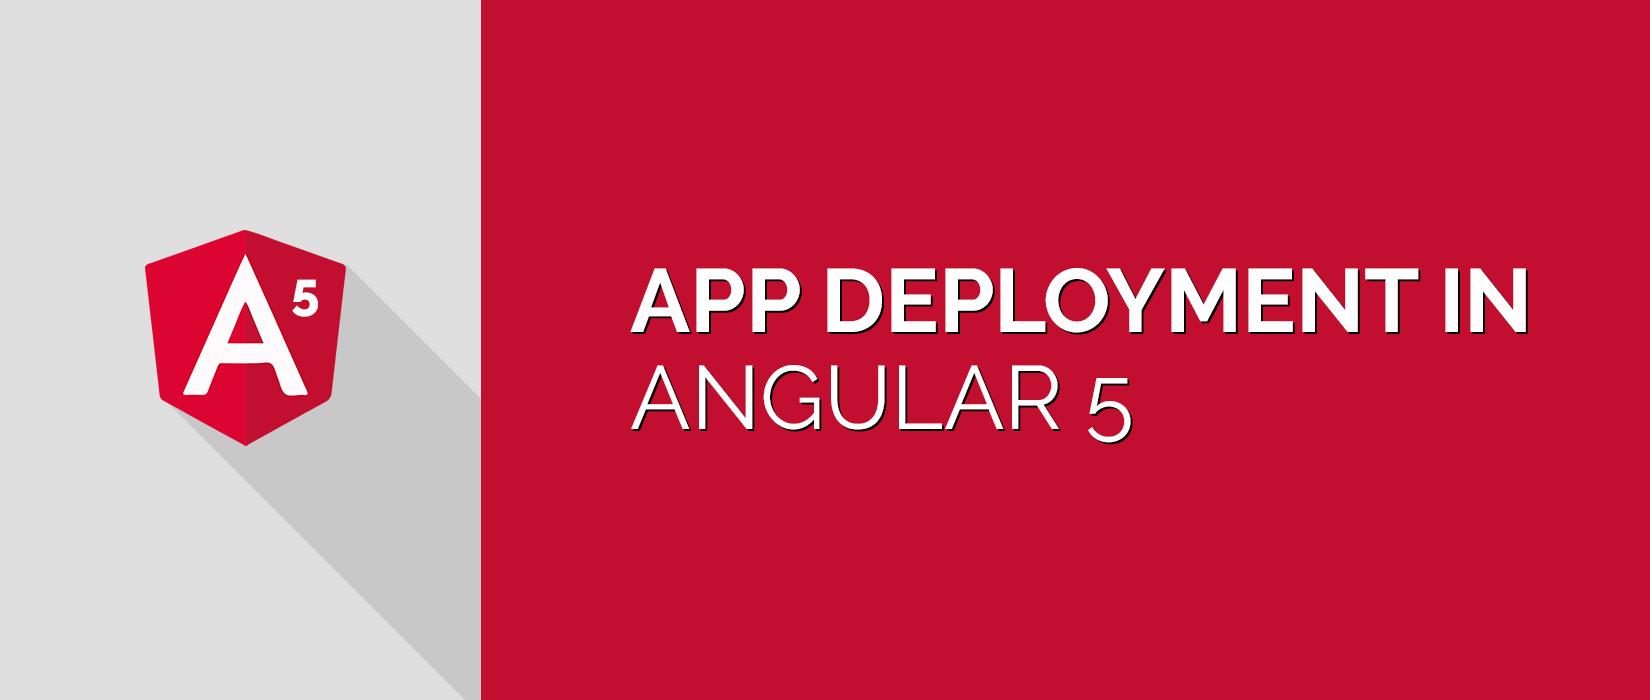 Angular 5 Deployment - Deploy your Angular App